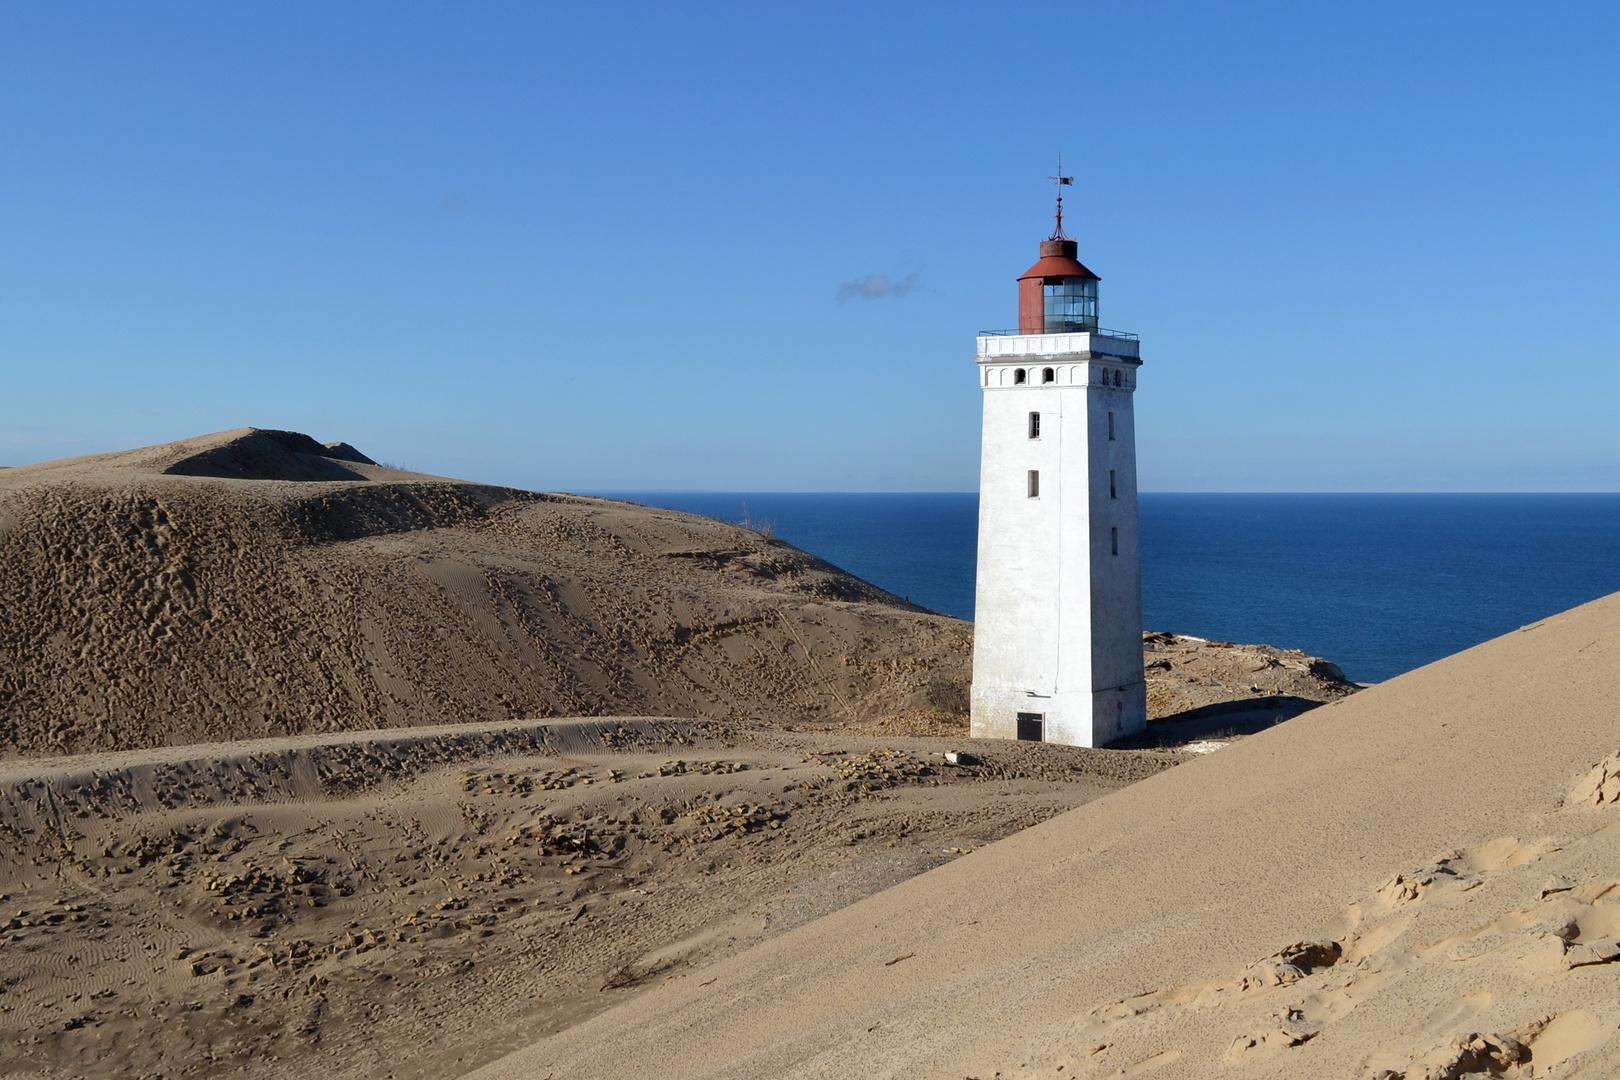 Rubjerg Knude Fyr - Leuchturm in Dänemark bei Lokken